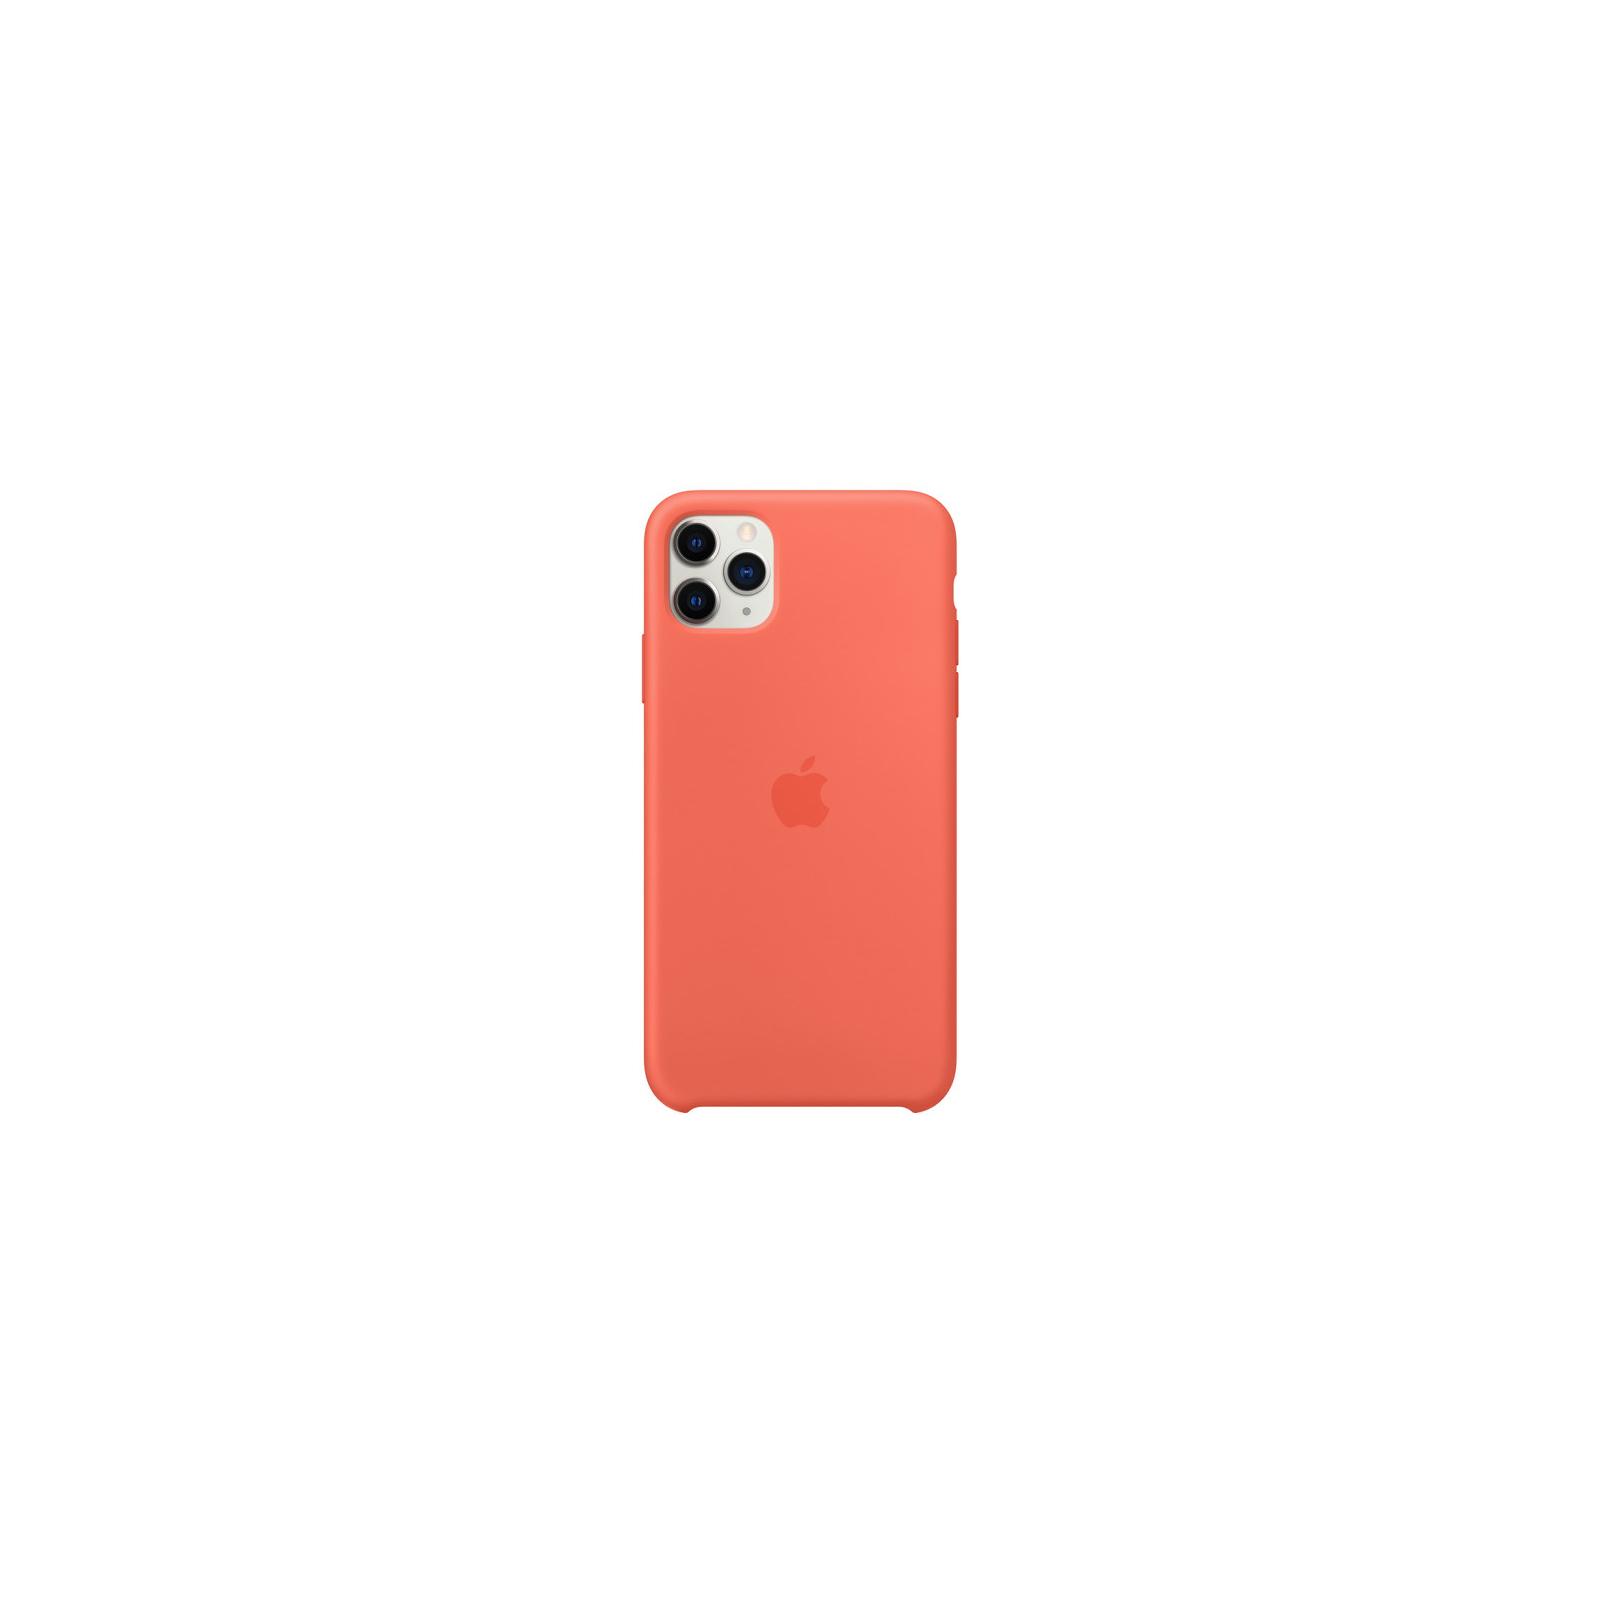 Чехол для моб. телефона Apple iPhone 11 Pro Max Silicone Case - Clementine (Orange) (MX022ZM/A) изображение 2